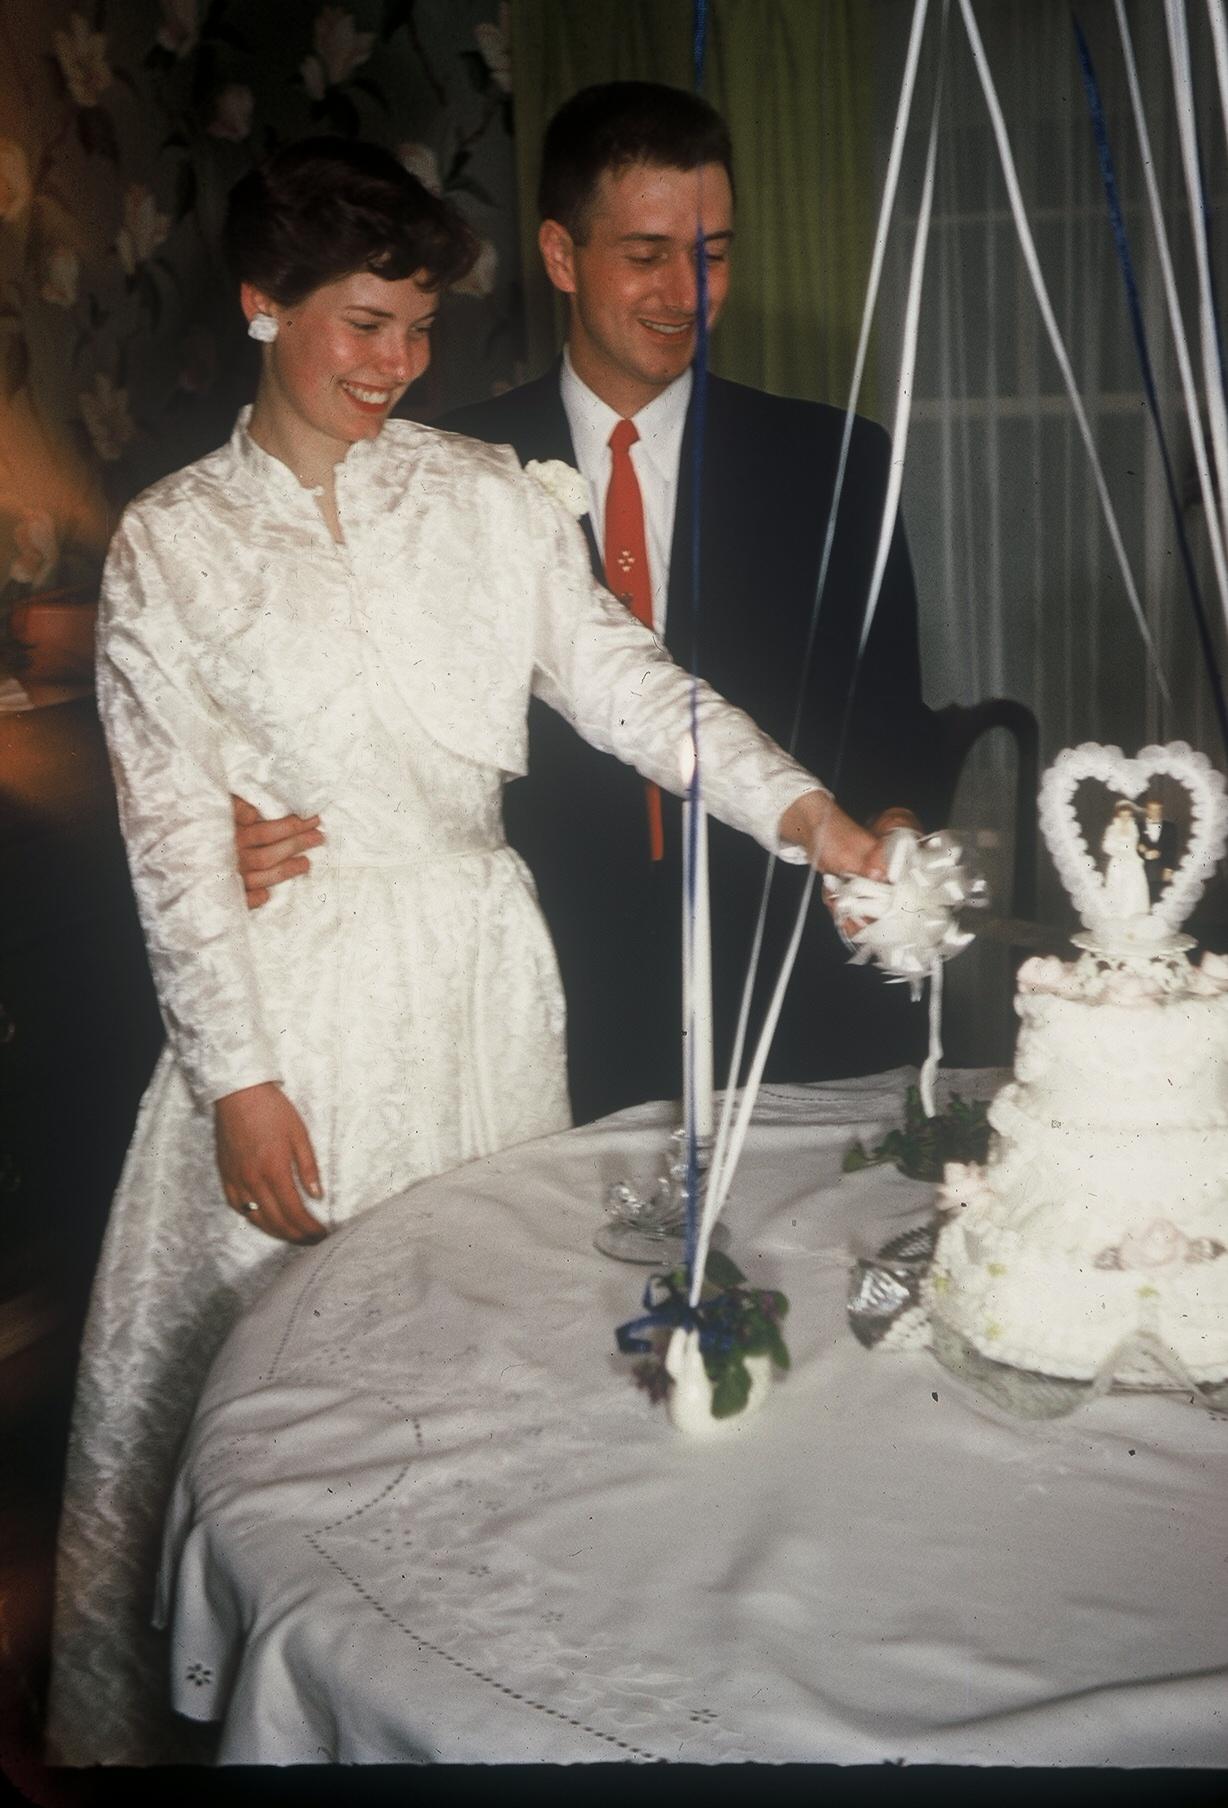 Howard and Kay Wedding Cake.jpg